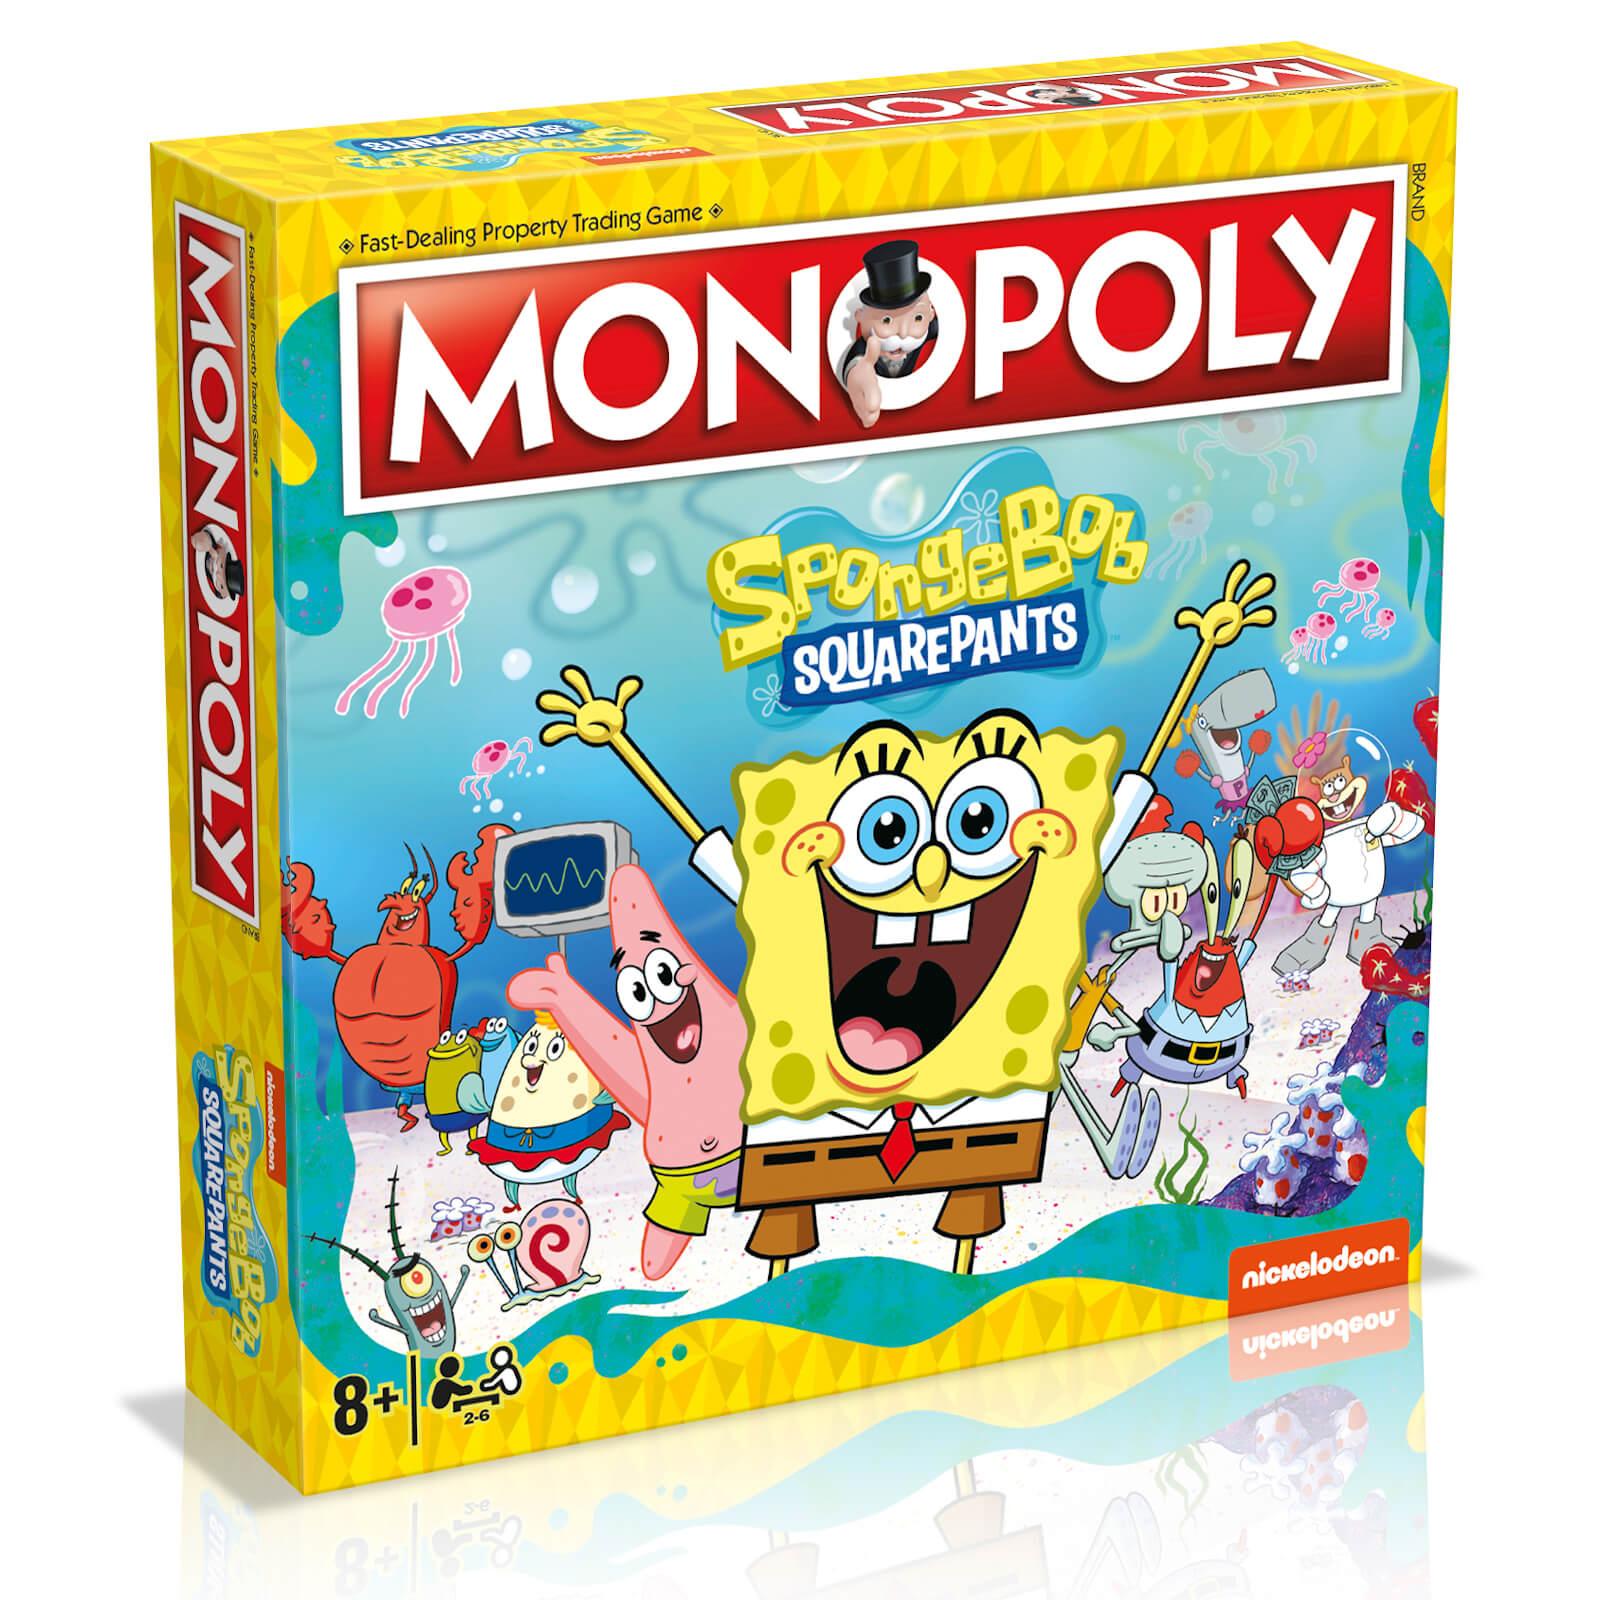 Image of Monopoly Board Game - Spongebob Squarepants